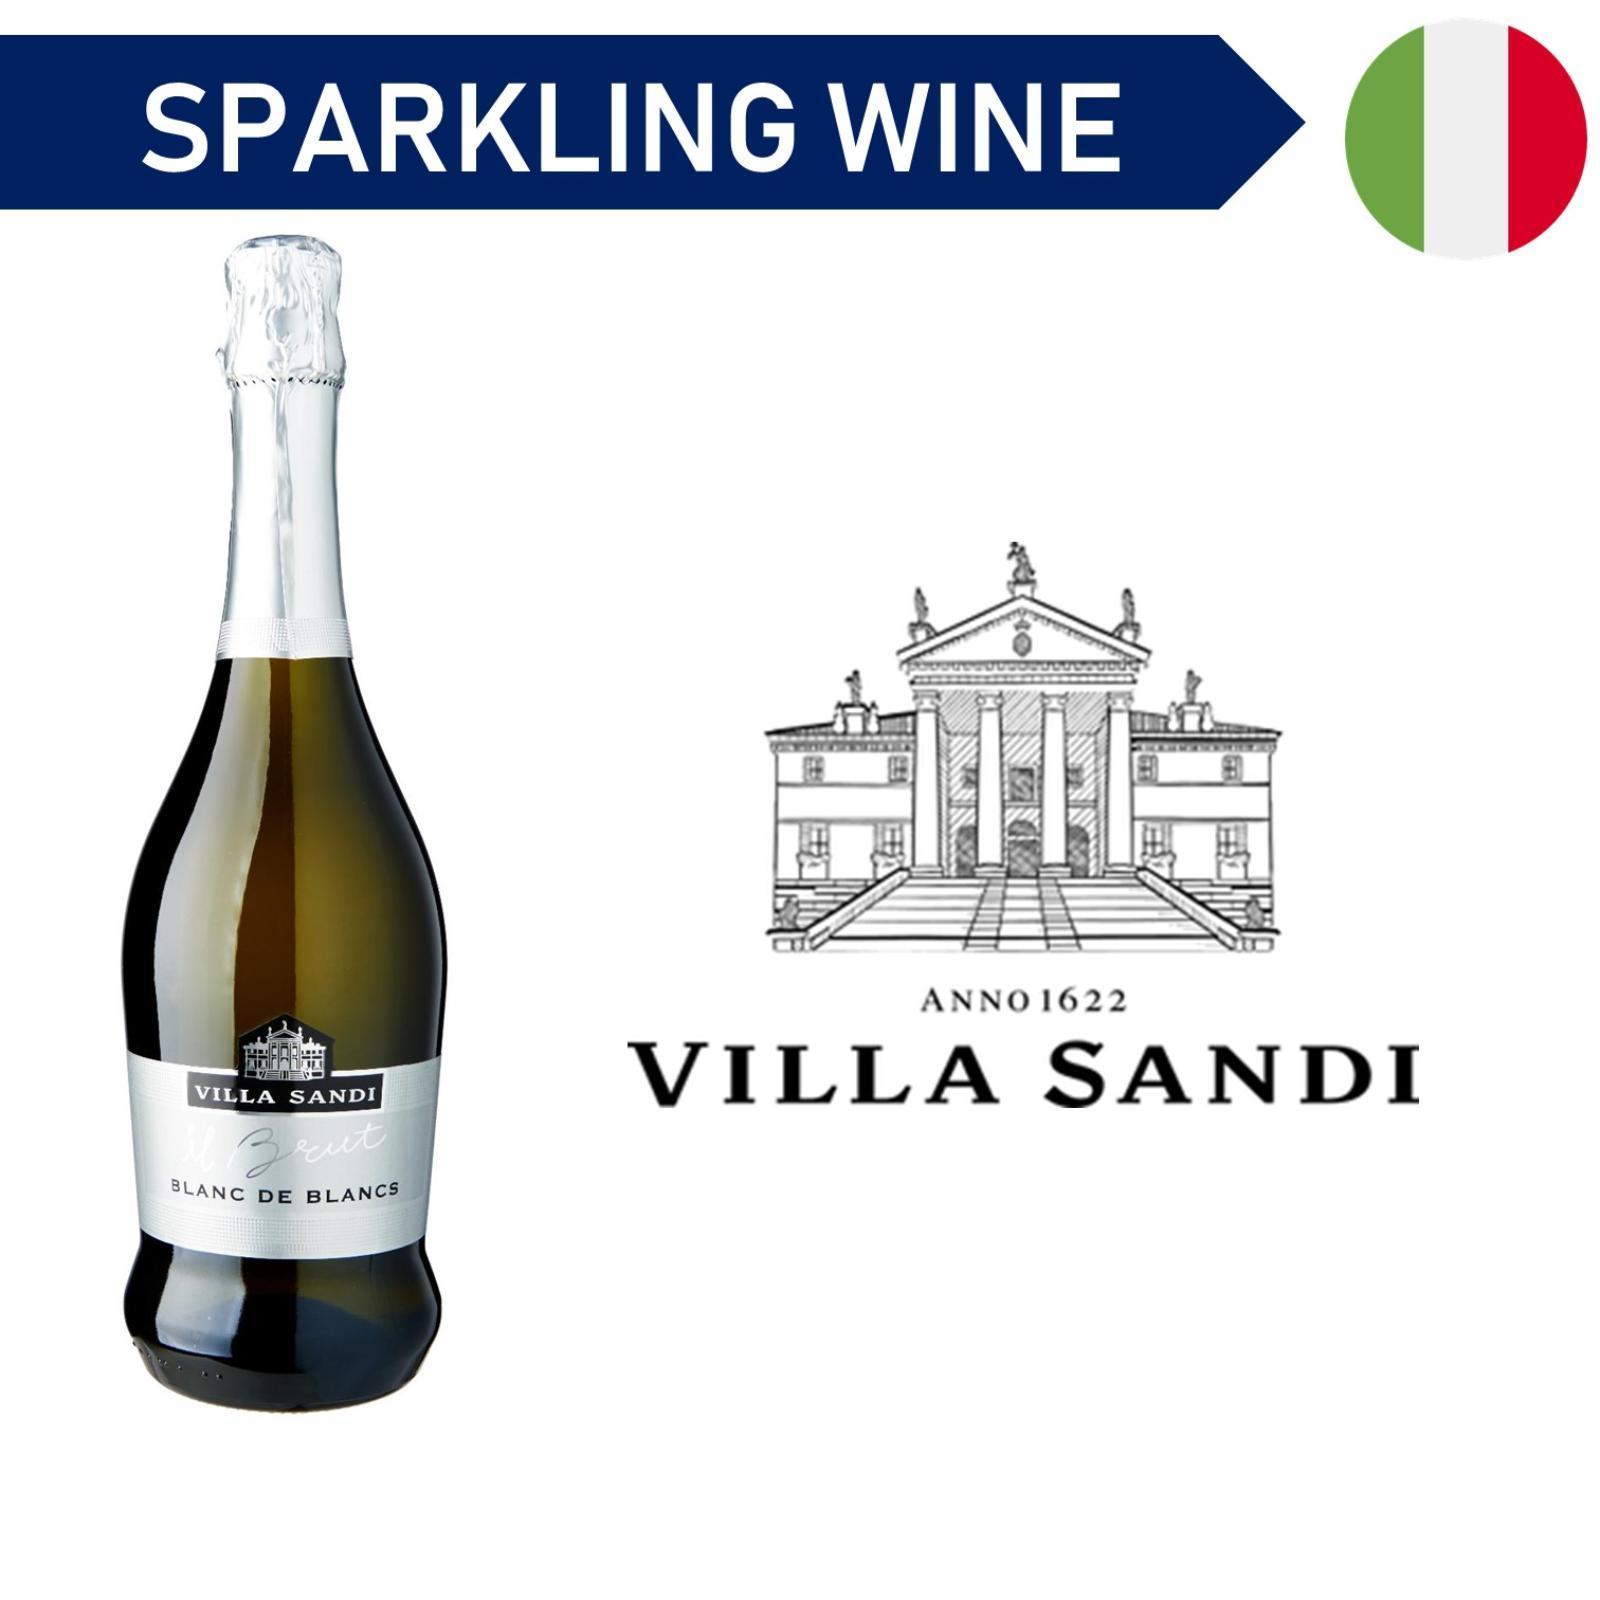 Villa Sandi Brut Blanc De Blancs Sparkling Wine